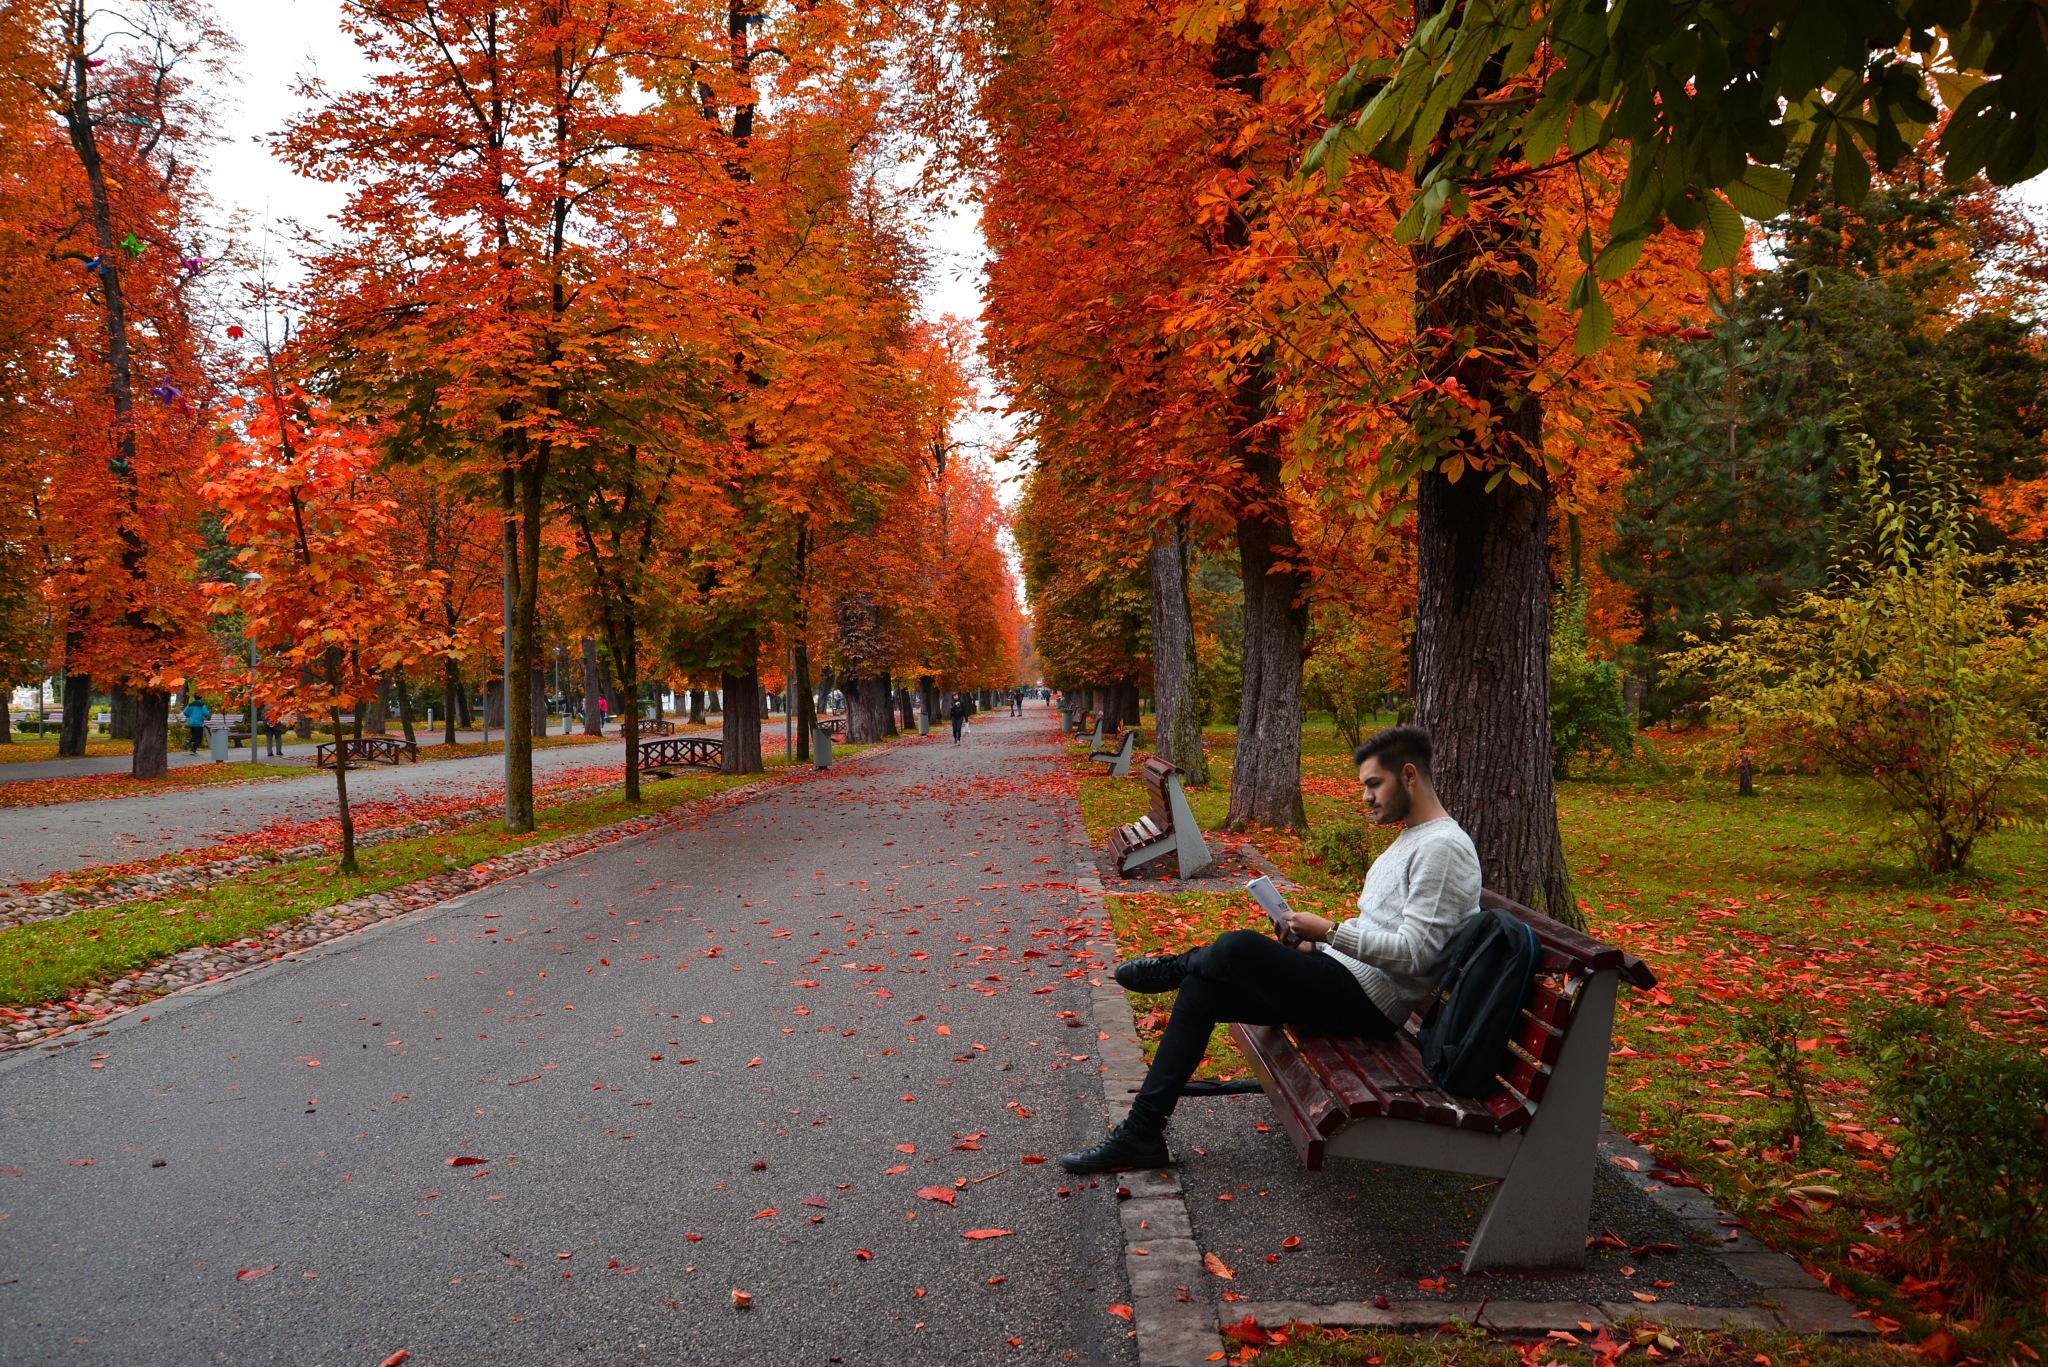 The best way to relax. by Ovidiu Bancila